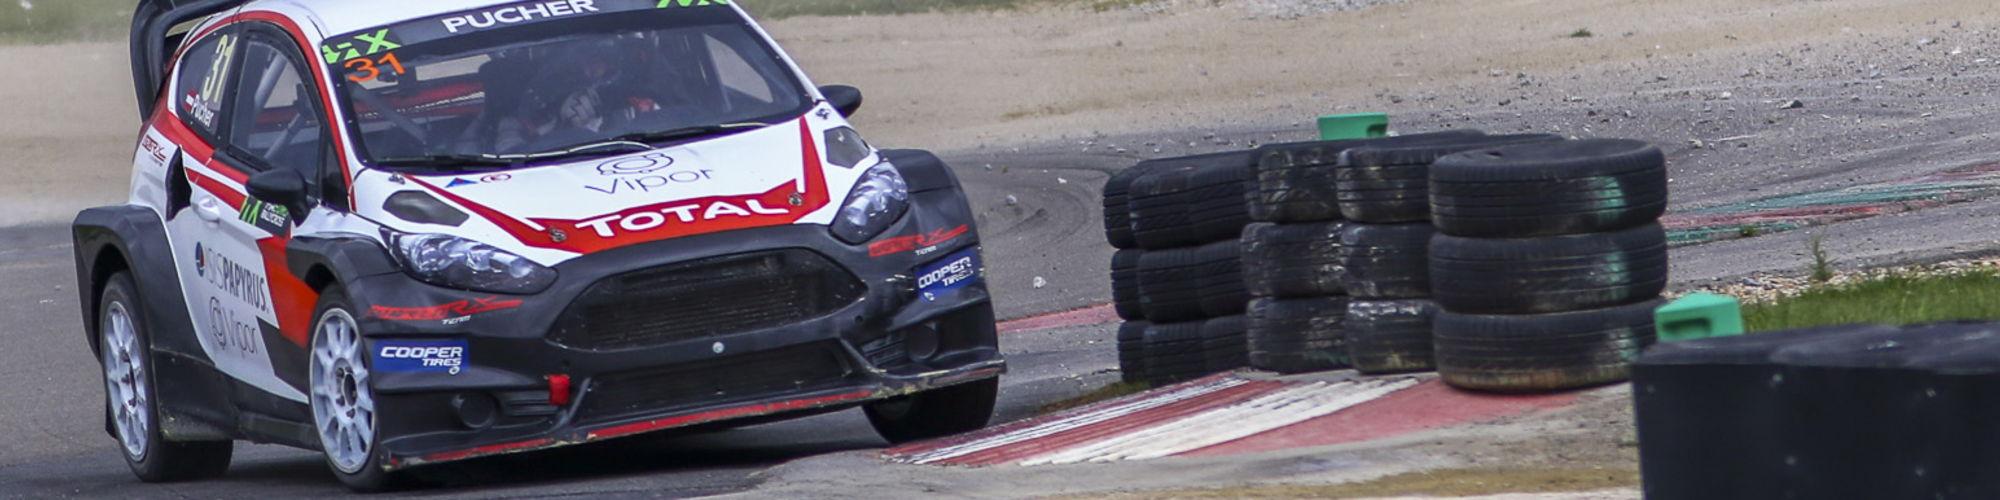 MJP Racing GmbH & Co KG